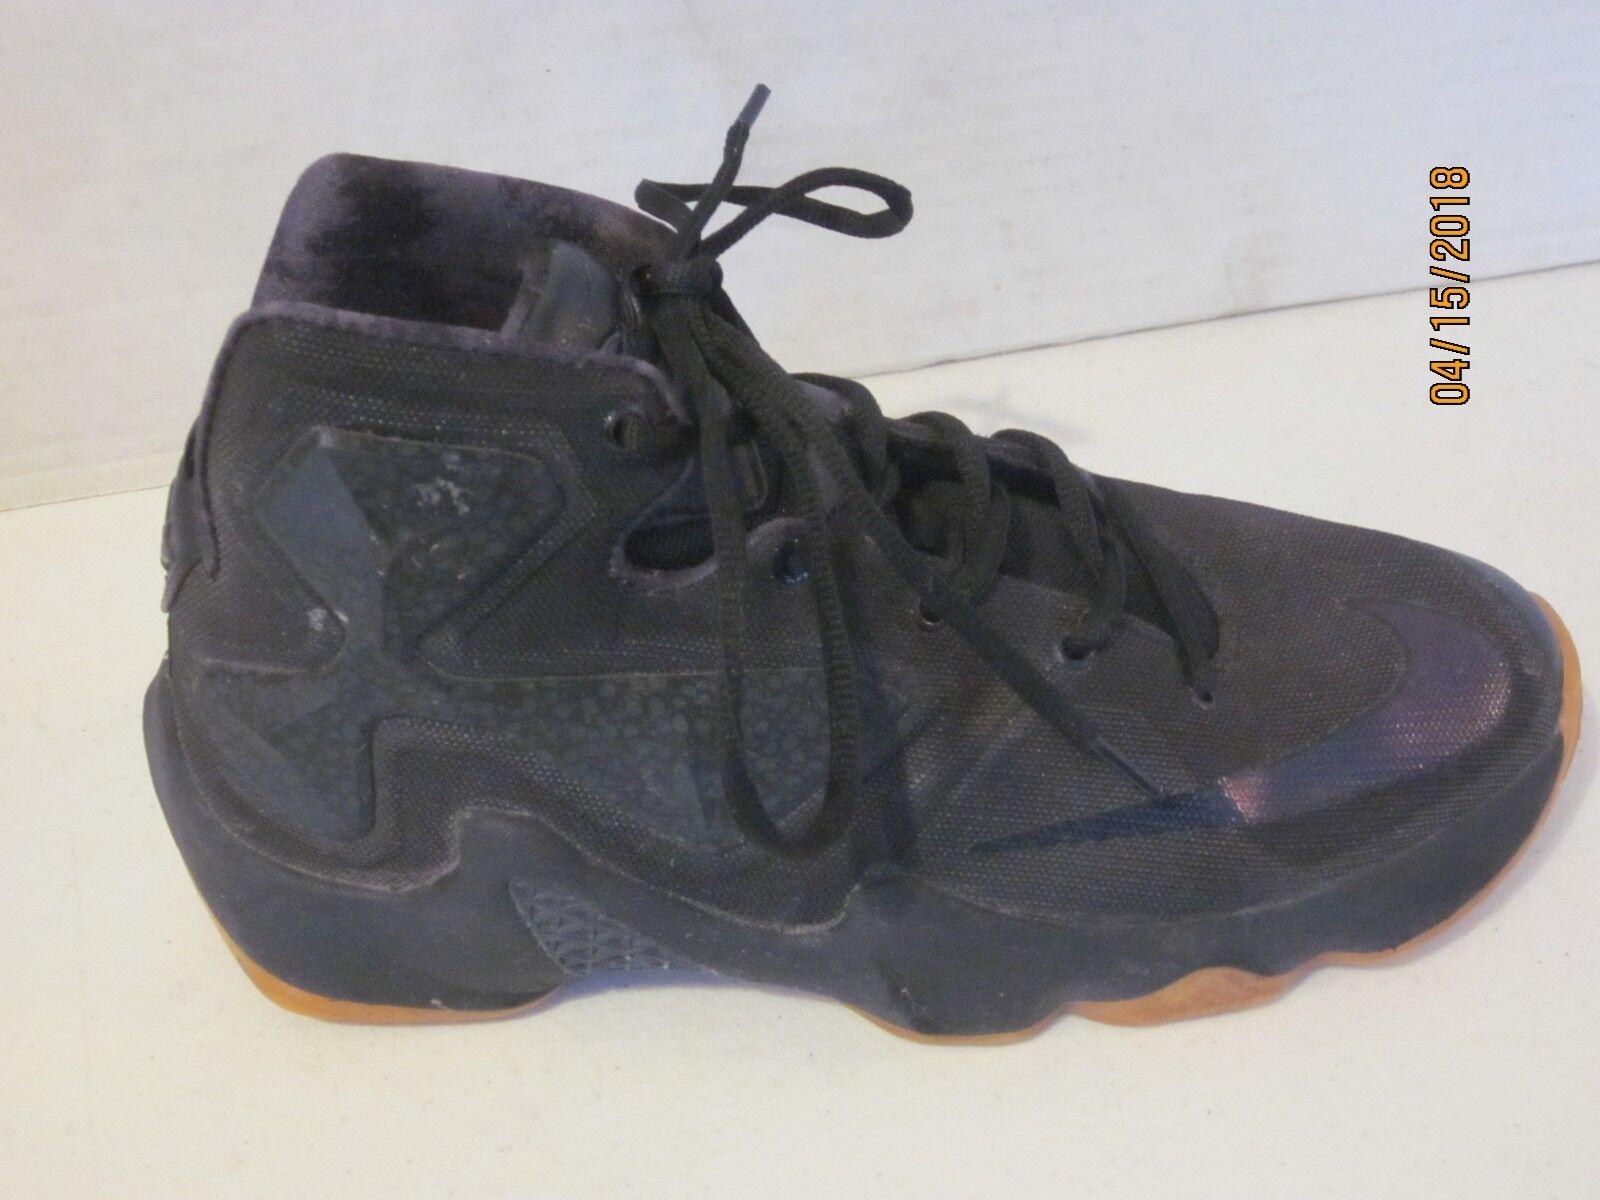 2018 Nike Lebron XIII 13 Black Lion SZ 9.5 Black Black Anthracite 807219-001 j28